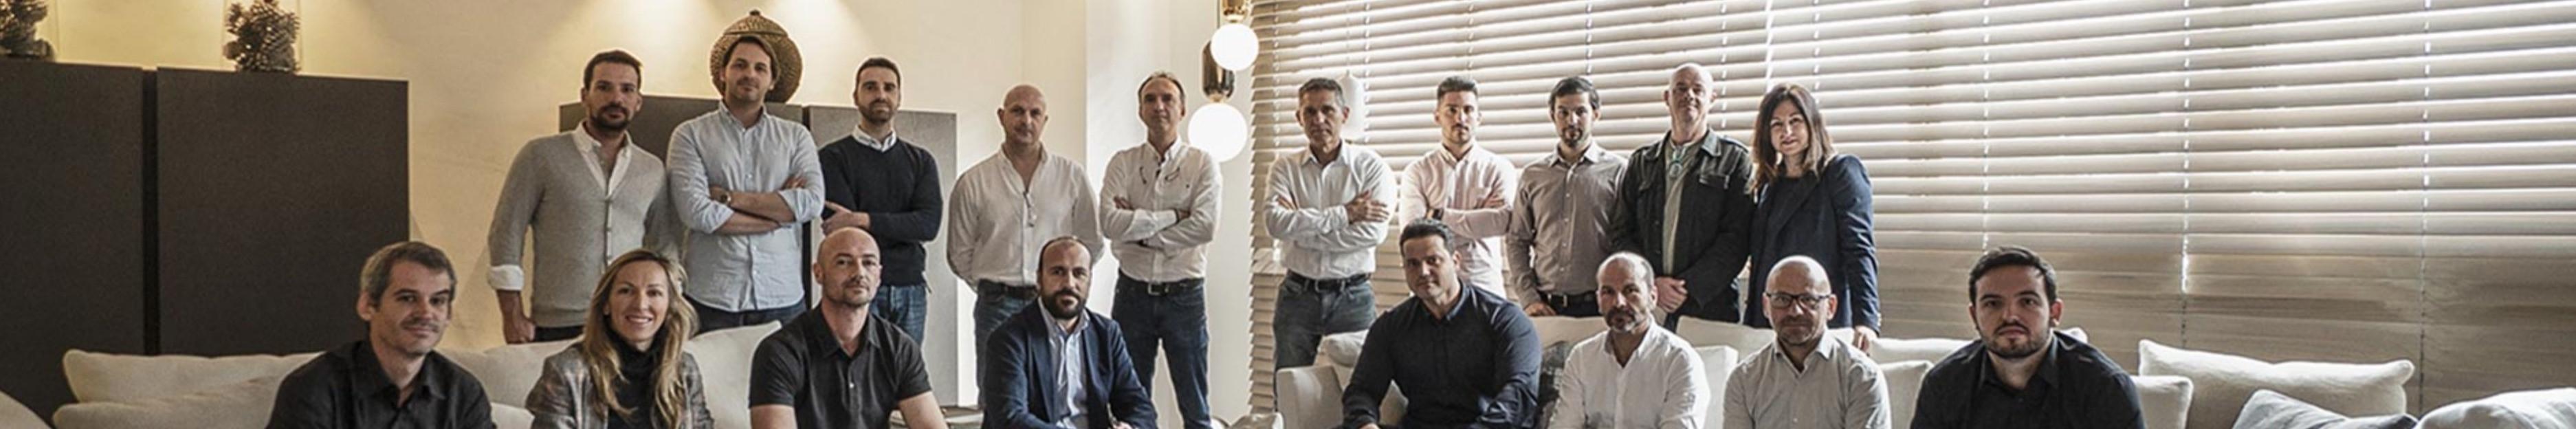 ARK Architects | Premium Architect in Marbella